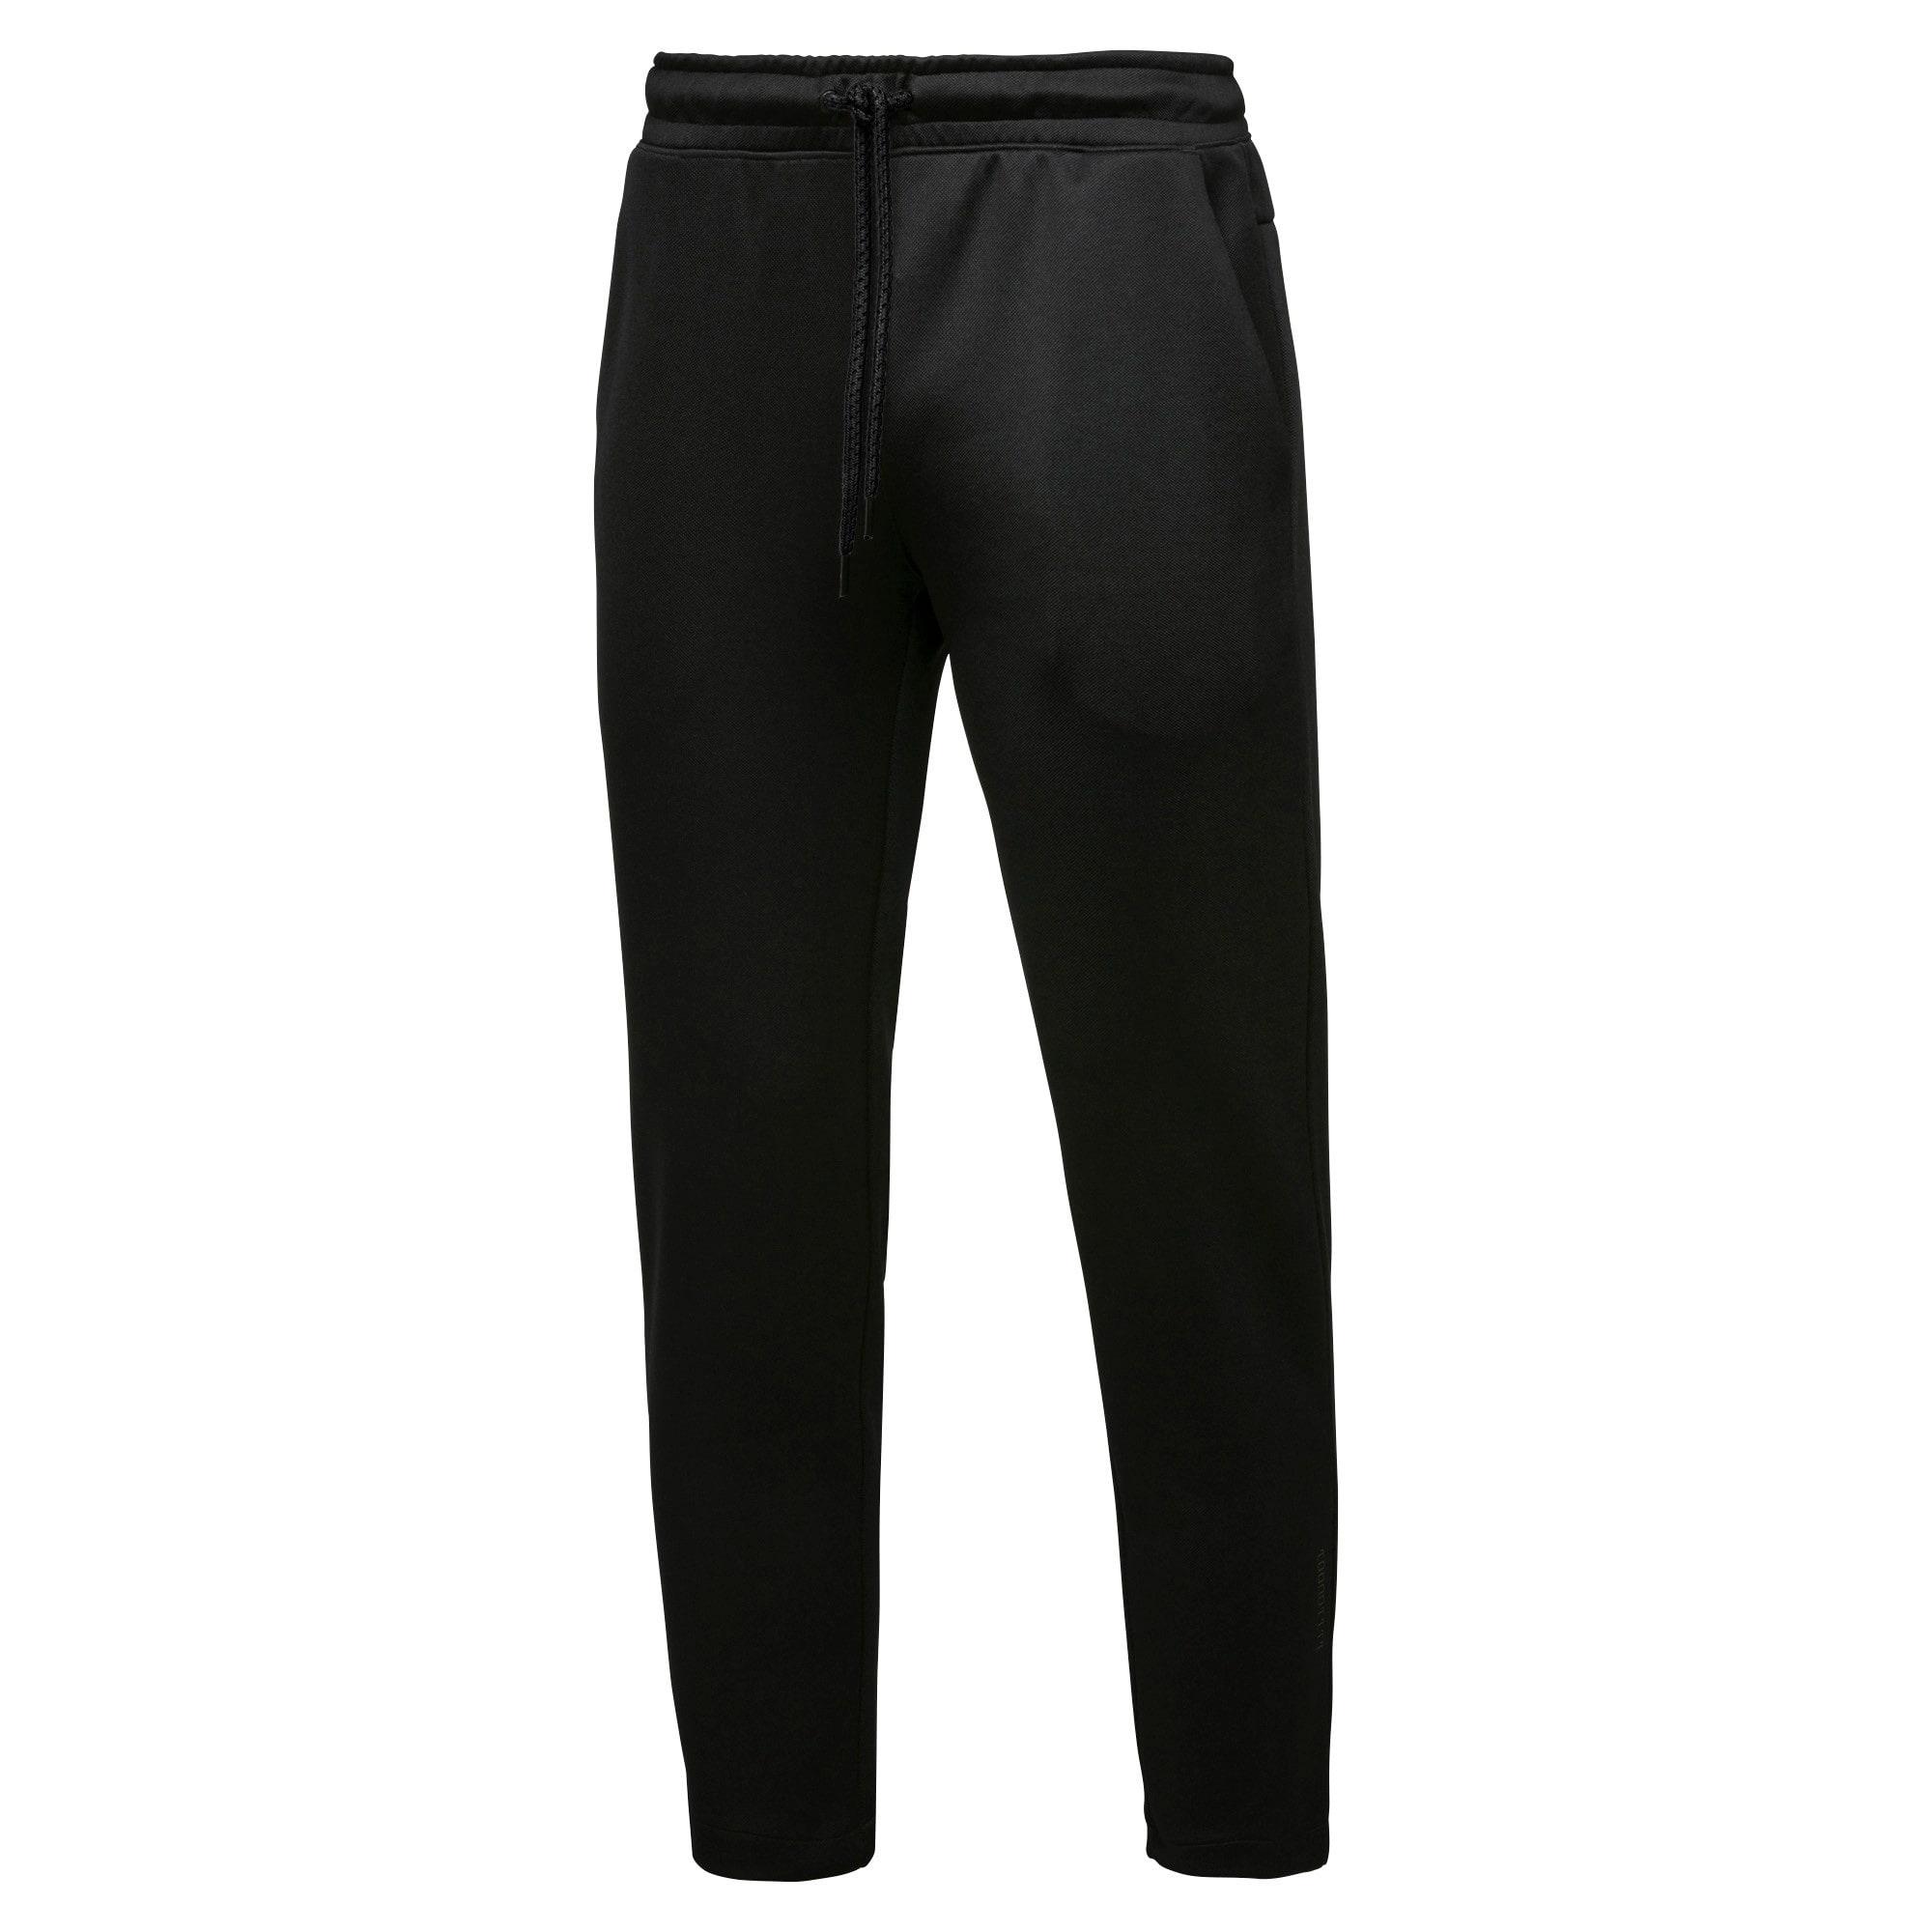 Thumbnail 1 of RS-0 CAPSULE PANTS, Puma Black, medium-JPN